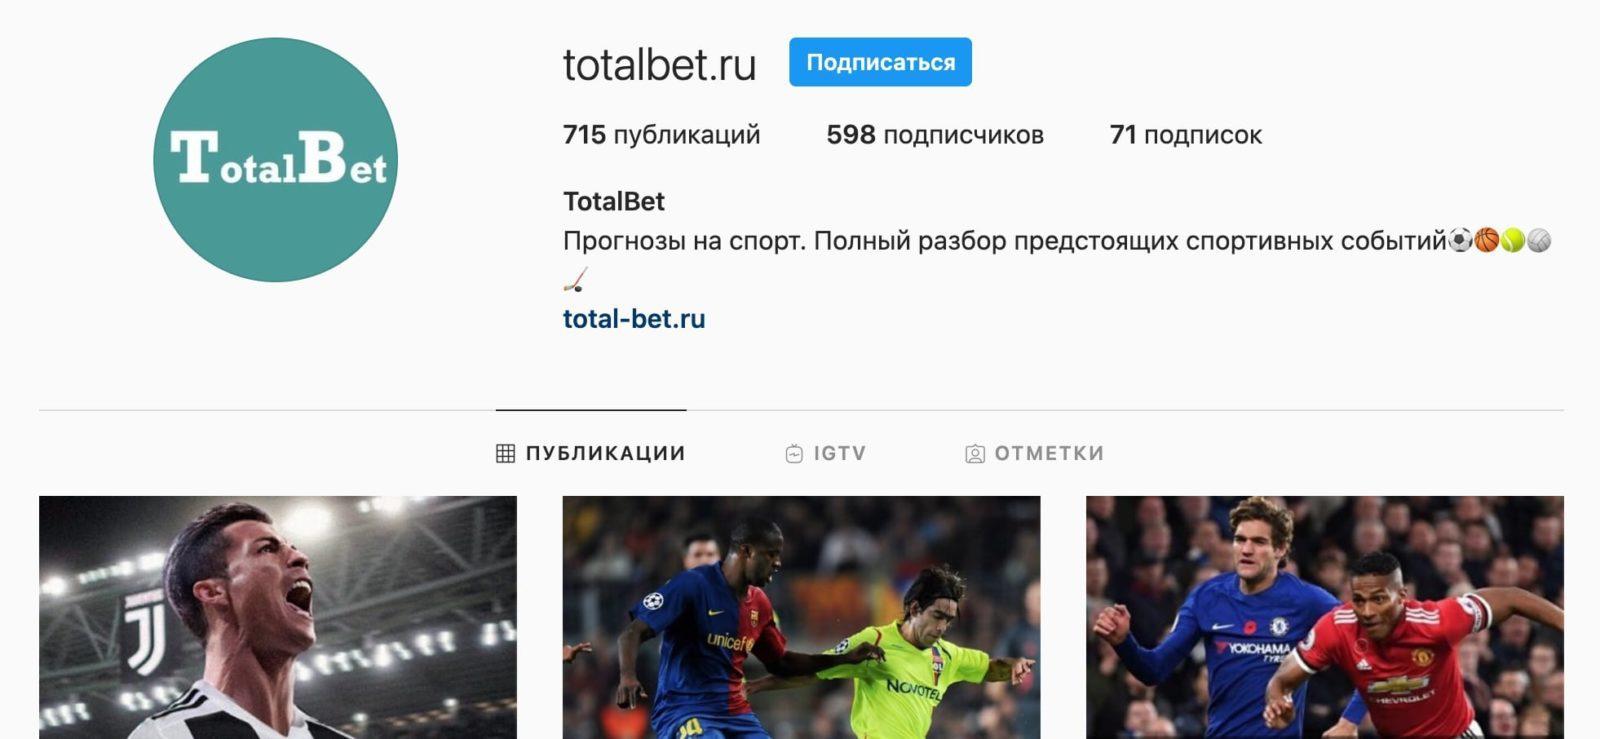 Инстаграм аккаунт TotalBet (Тотал бет)